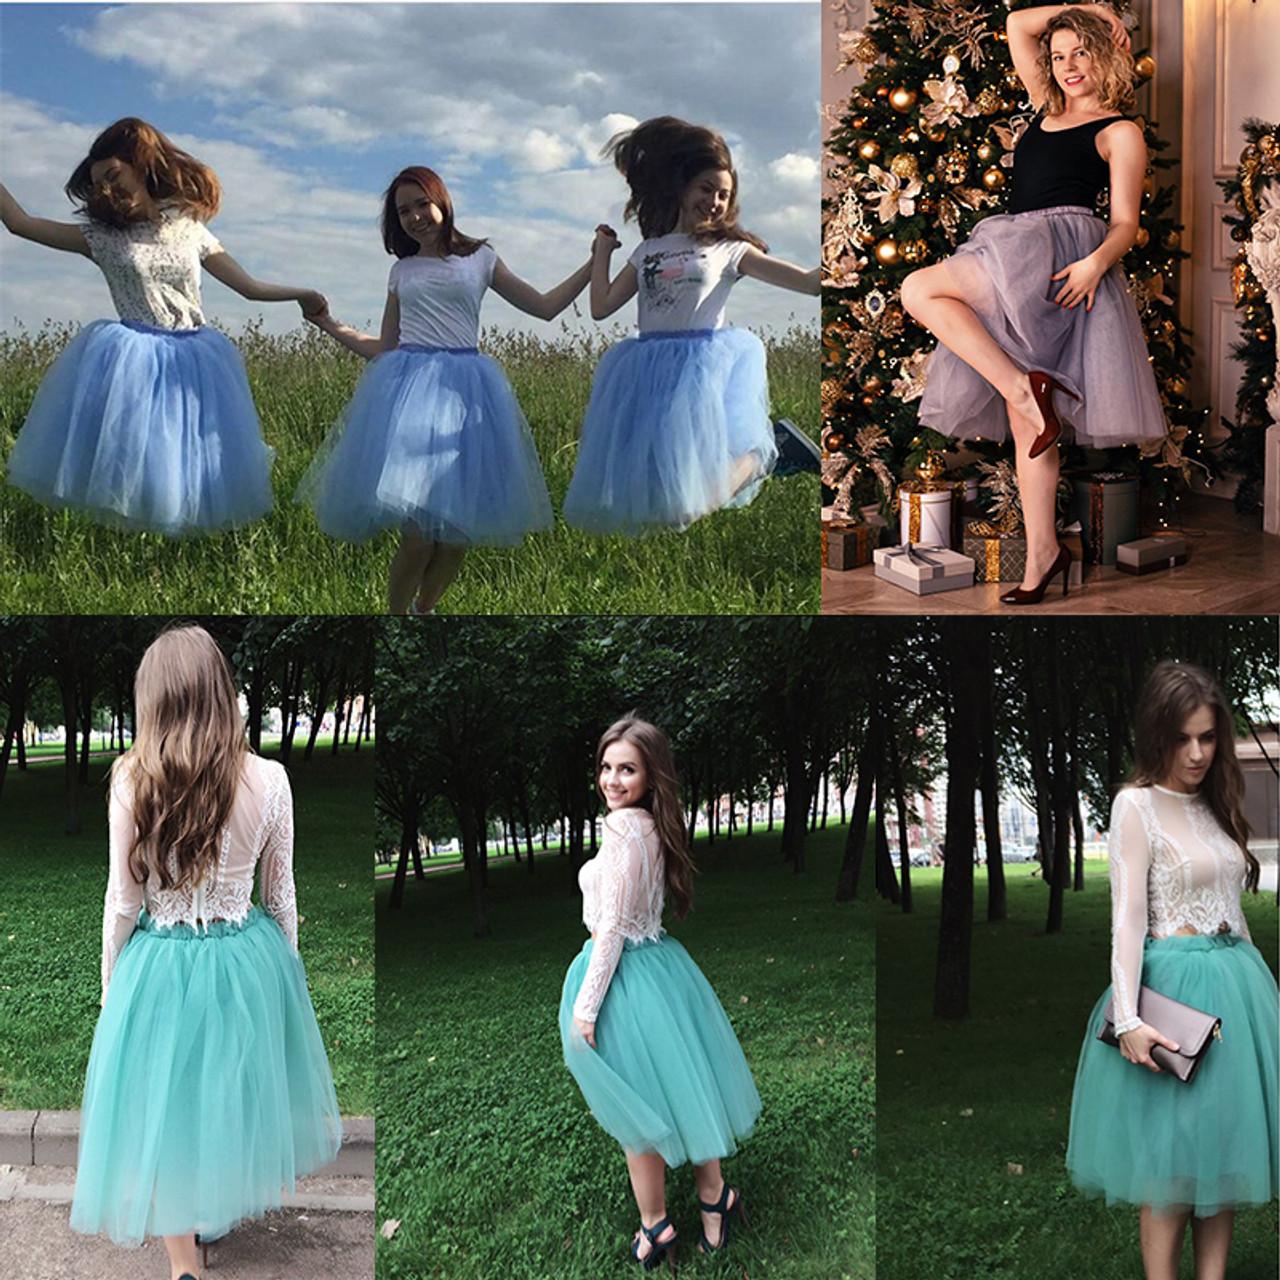 b3cc1c5507 ... 5 Layers 65cm Princess Midi Tulle Skirt Pleated Dance Tutu Skirts Womens  Lolita Petticoat Jupe Saia ...